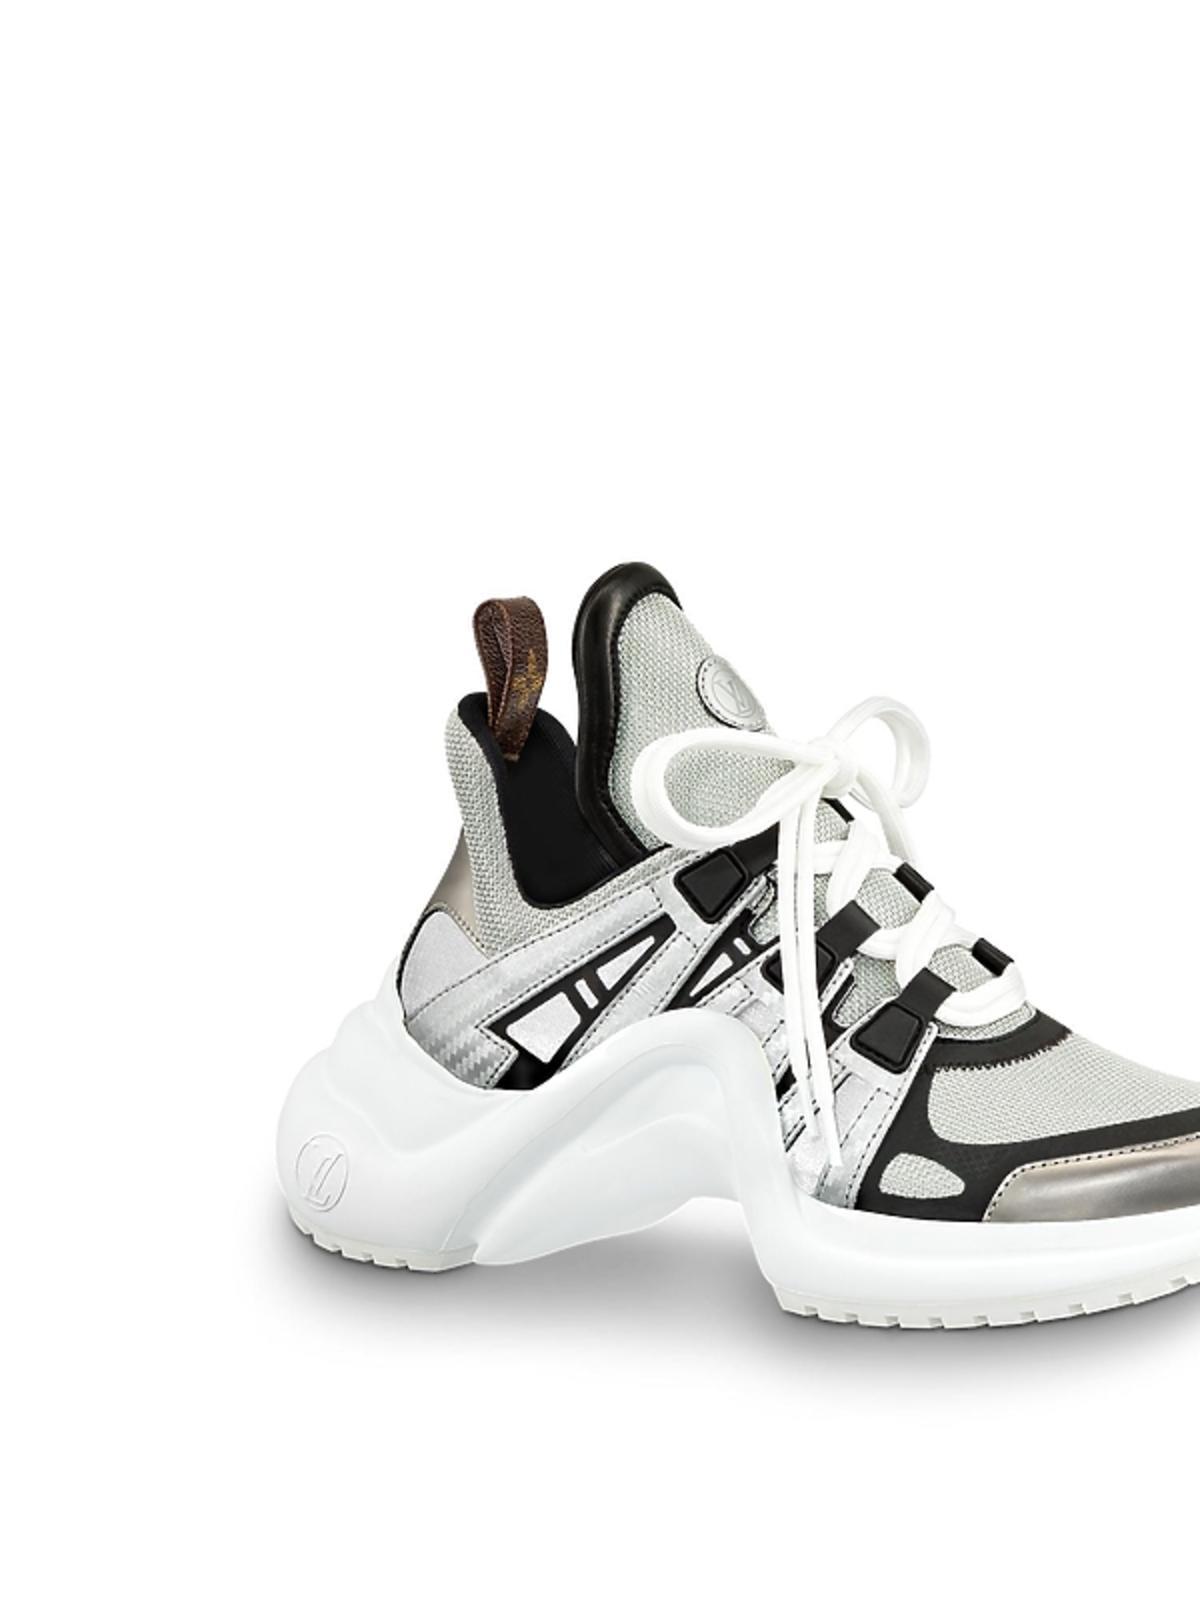 But sportowy Louis Vuitton Archlight